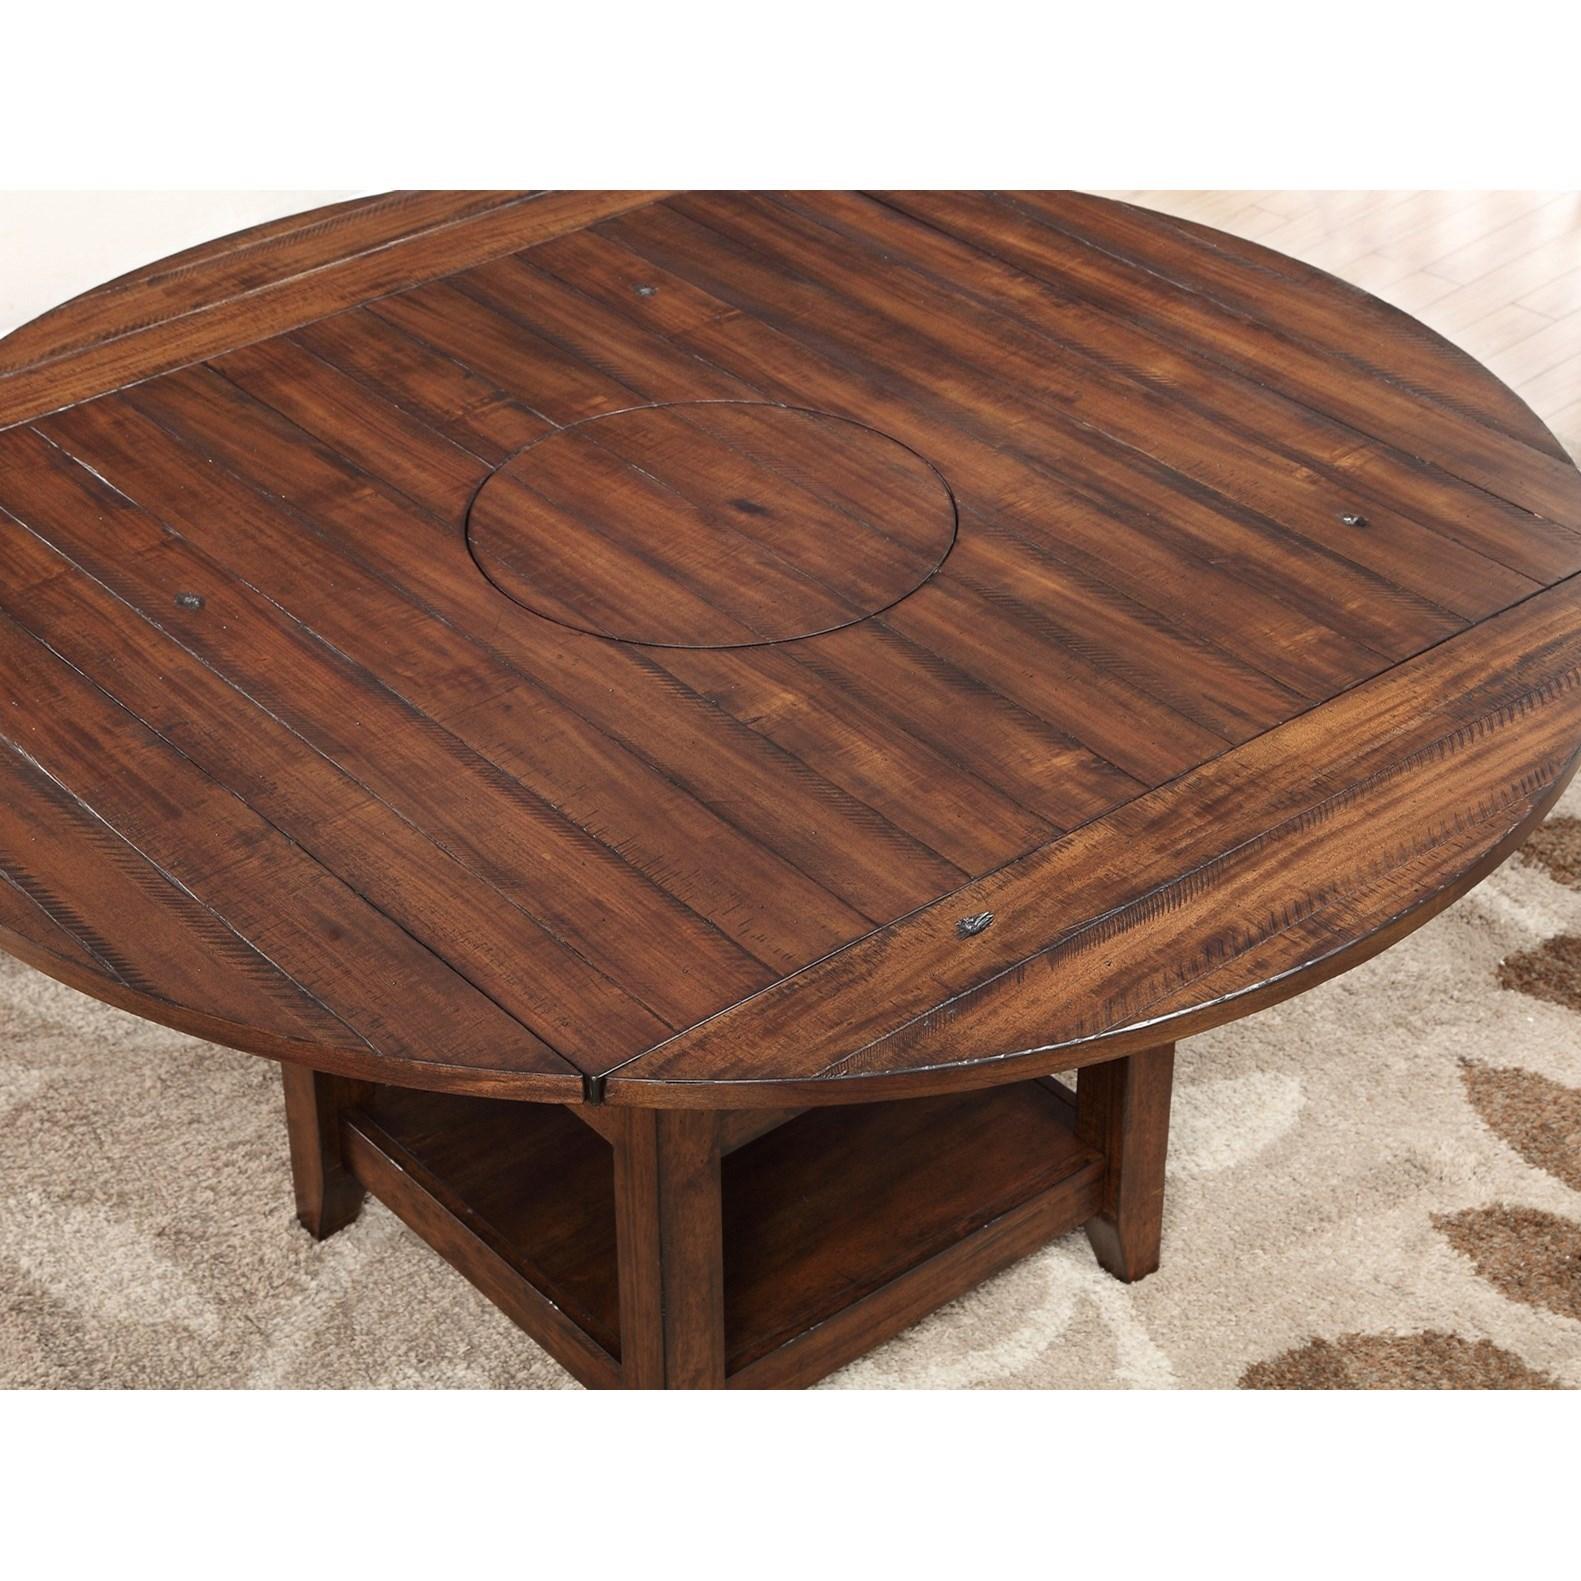 Legends furniture restoration restoration 65 round for Furniture 65